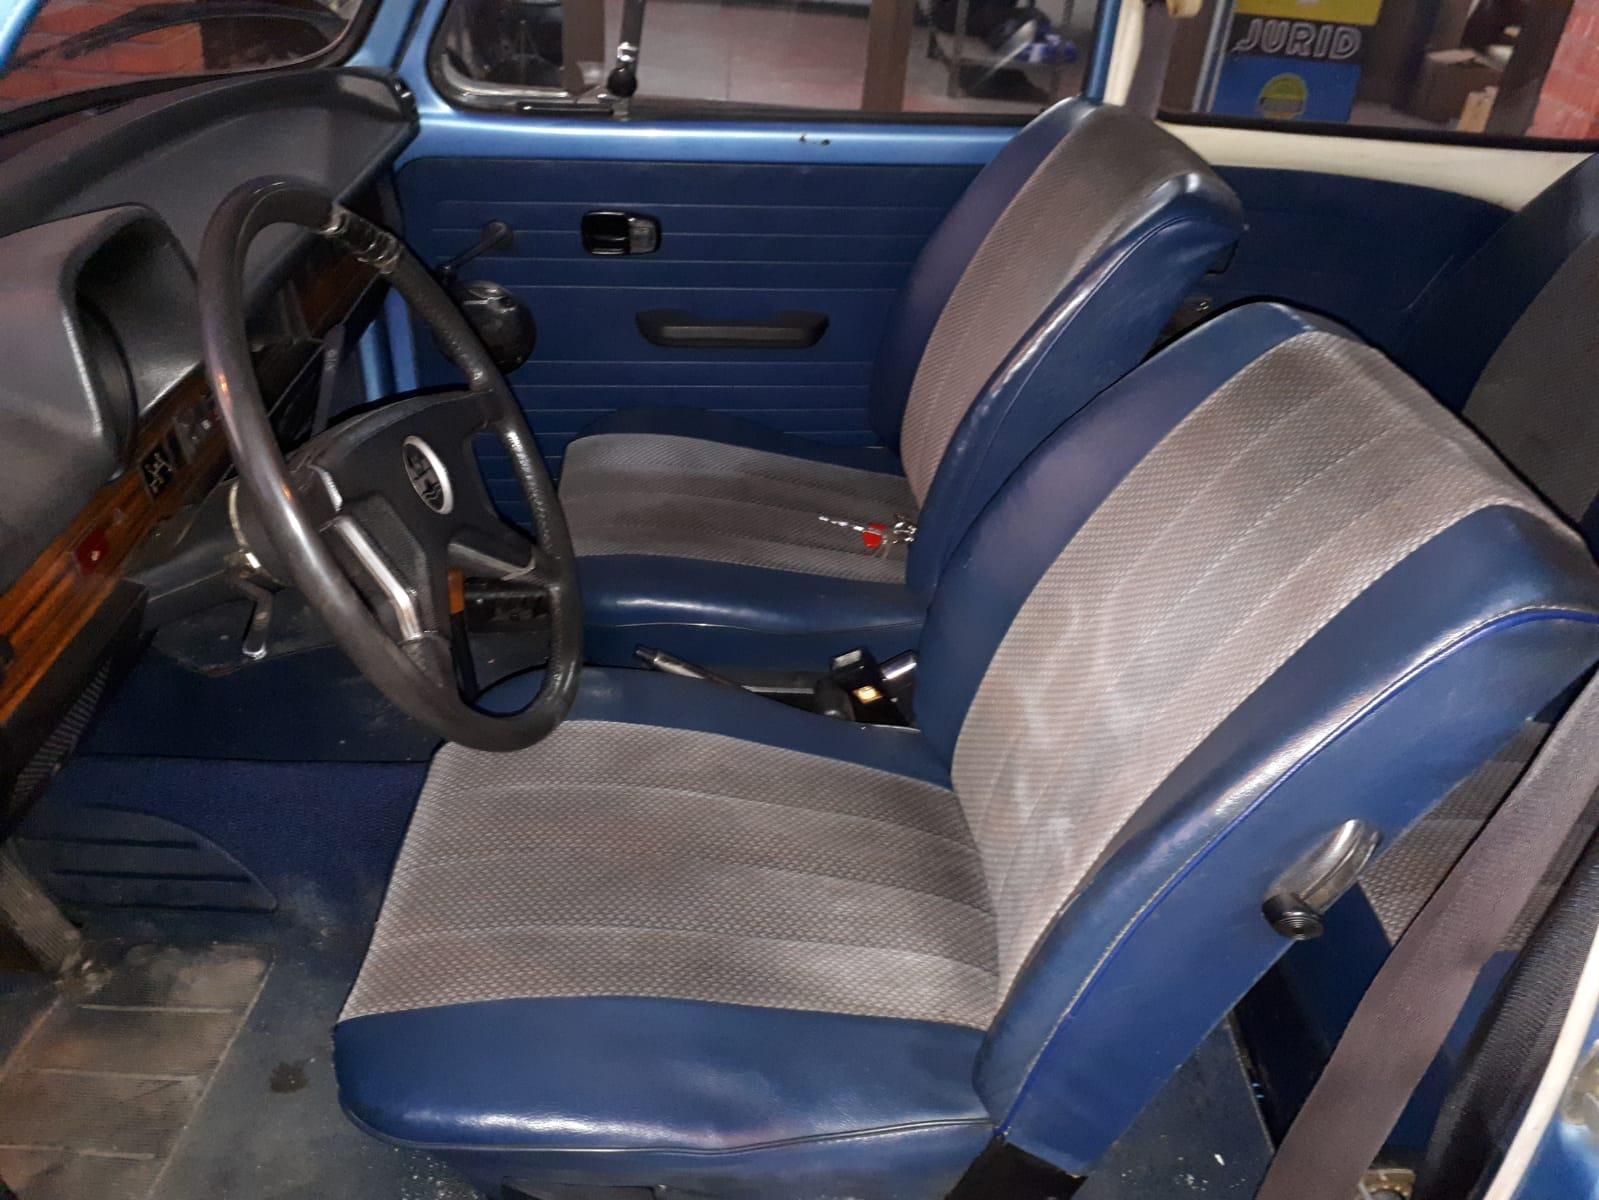 10739 Alquiler Volkswagen Beetle escarabajo Azul interior